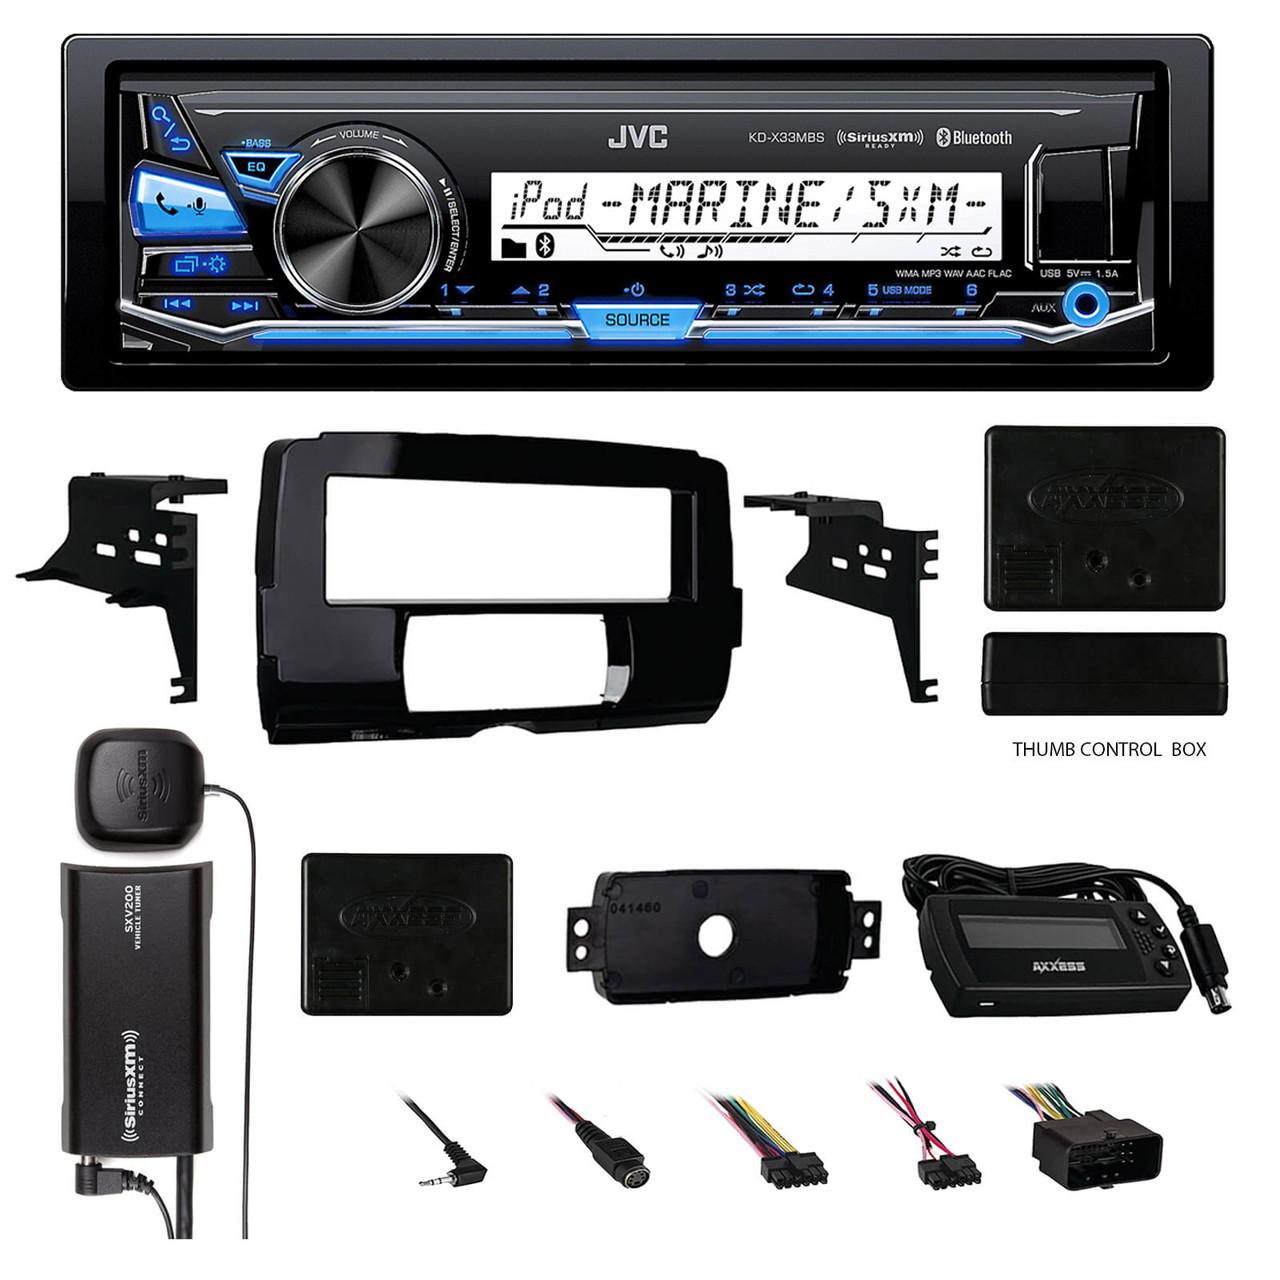 JVC Marine Bluetooth USB Radio, Harley FLHTC FLHT Install Adapter Kit, XM  Tuner